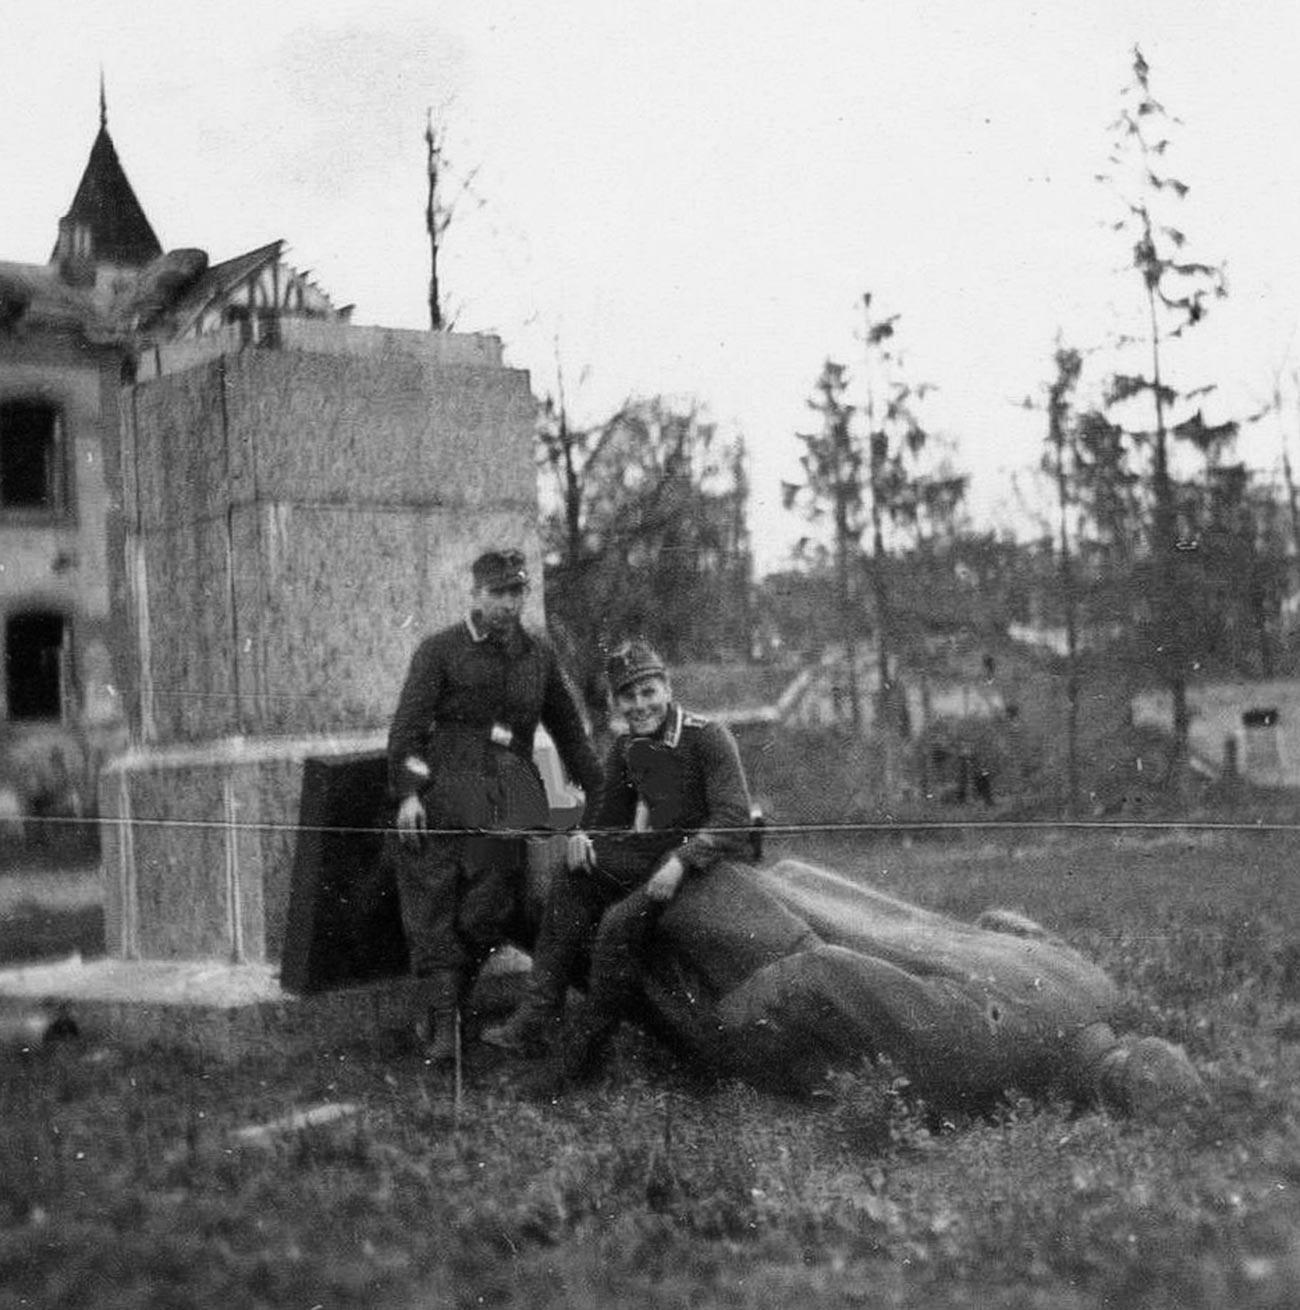 Nemška vojaka pri podrtem Leninovem spomeniku, 1941